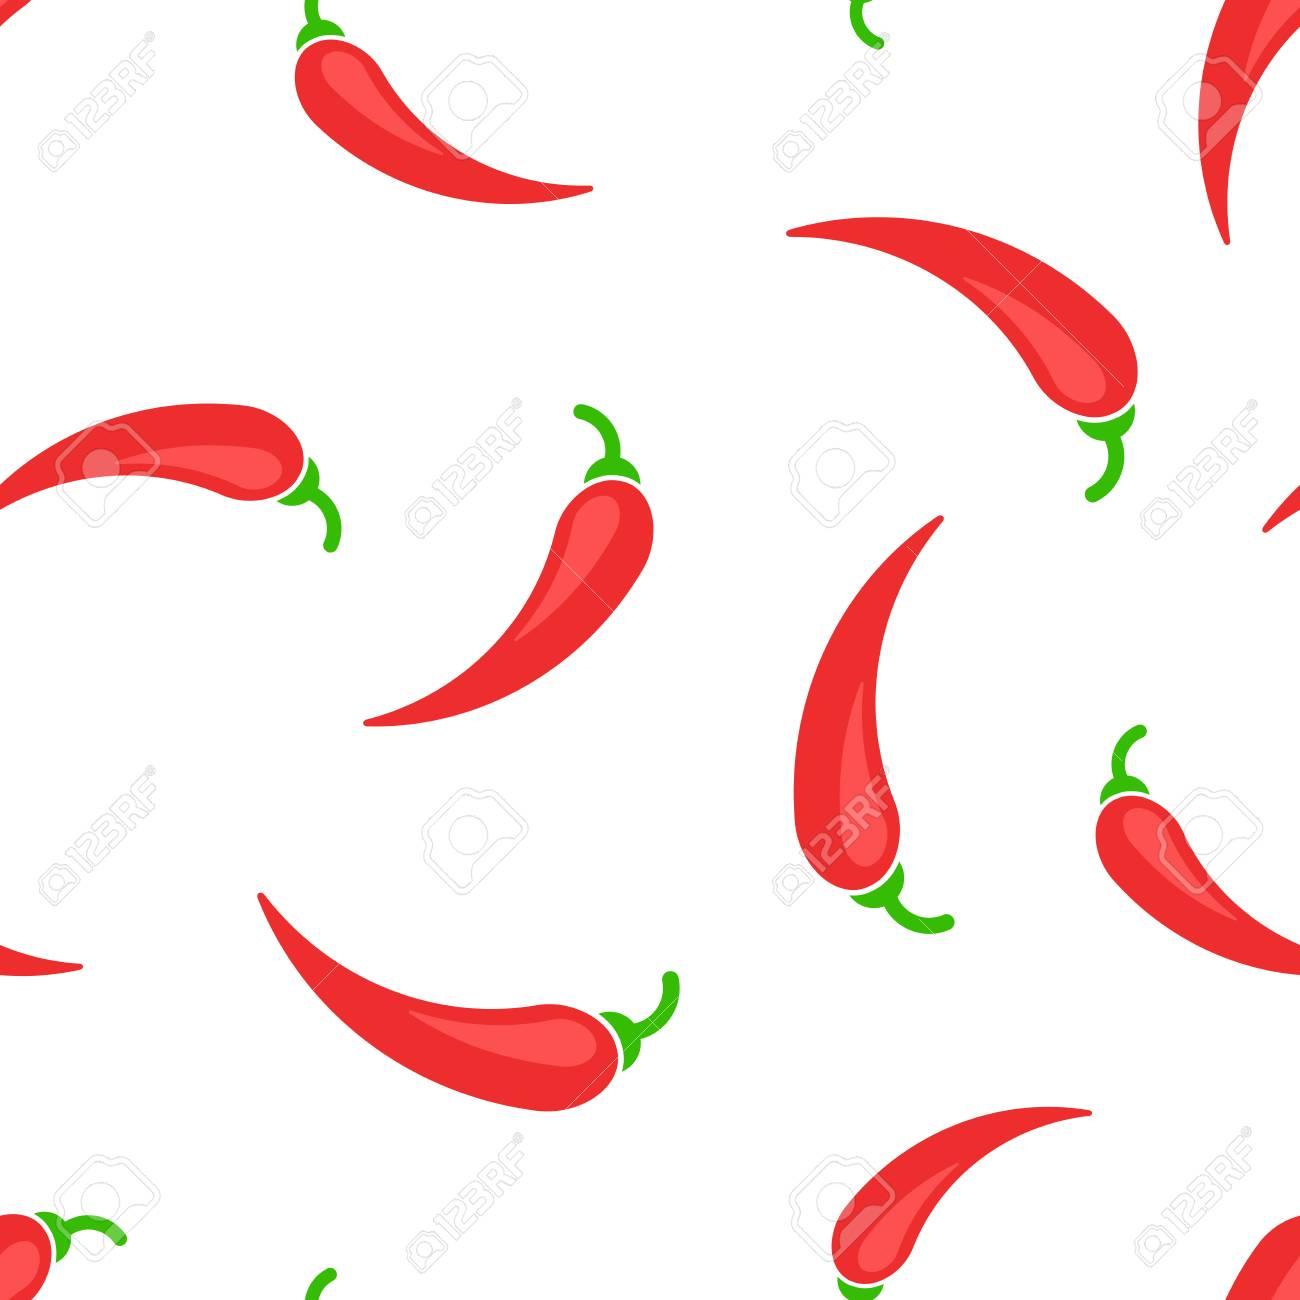 Chili pepper icon seamless pattern background. Business concept vector illustration. Chili paprika symbol pattern. - 103580587